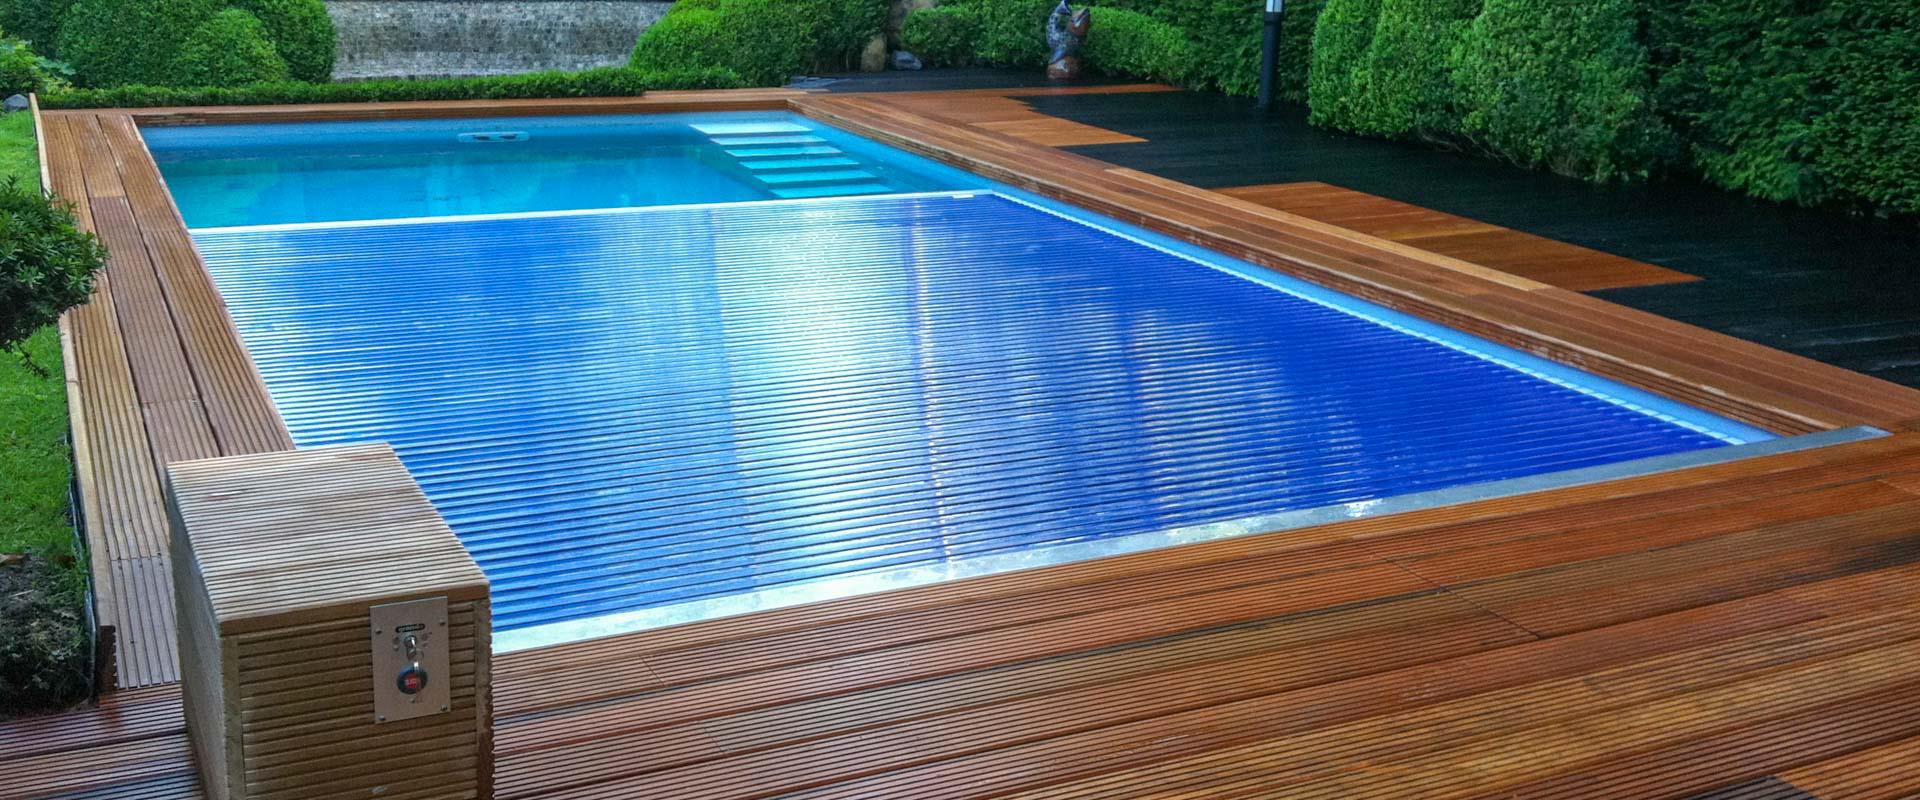 Automatic Rigid Pool Cover System Type Ibs 9 Grando